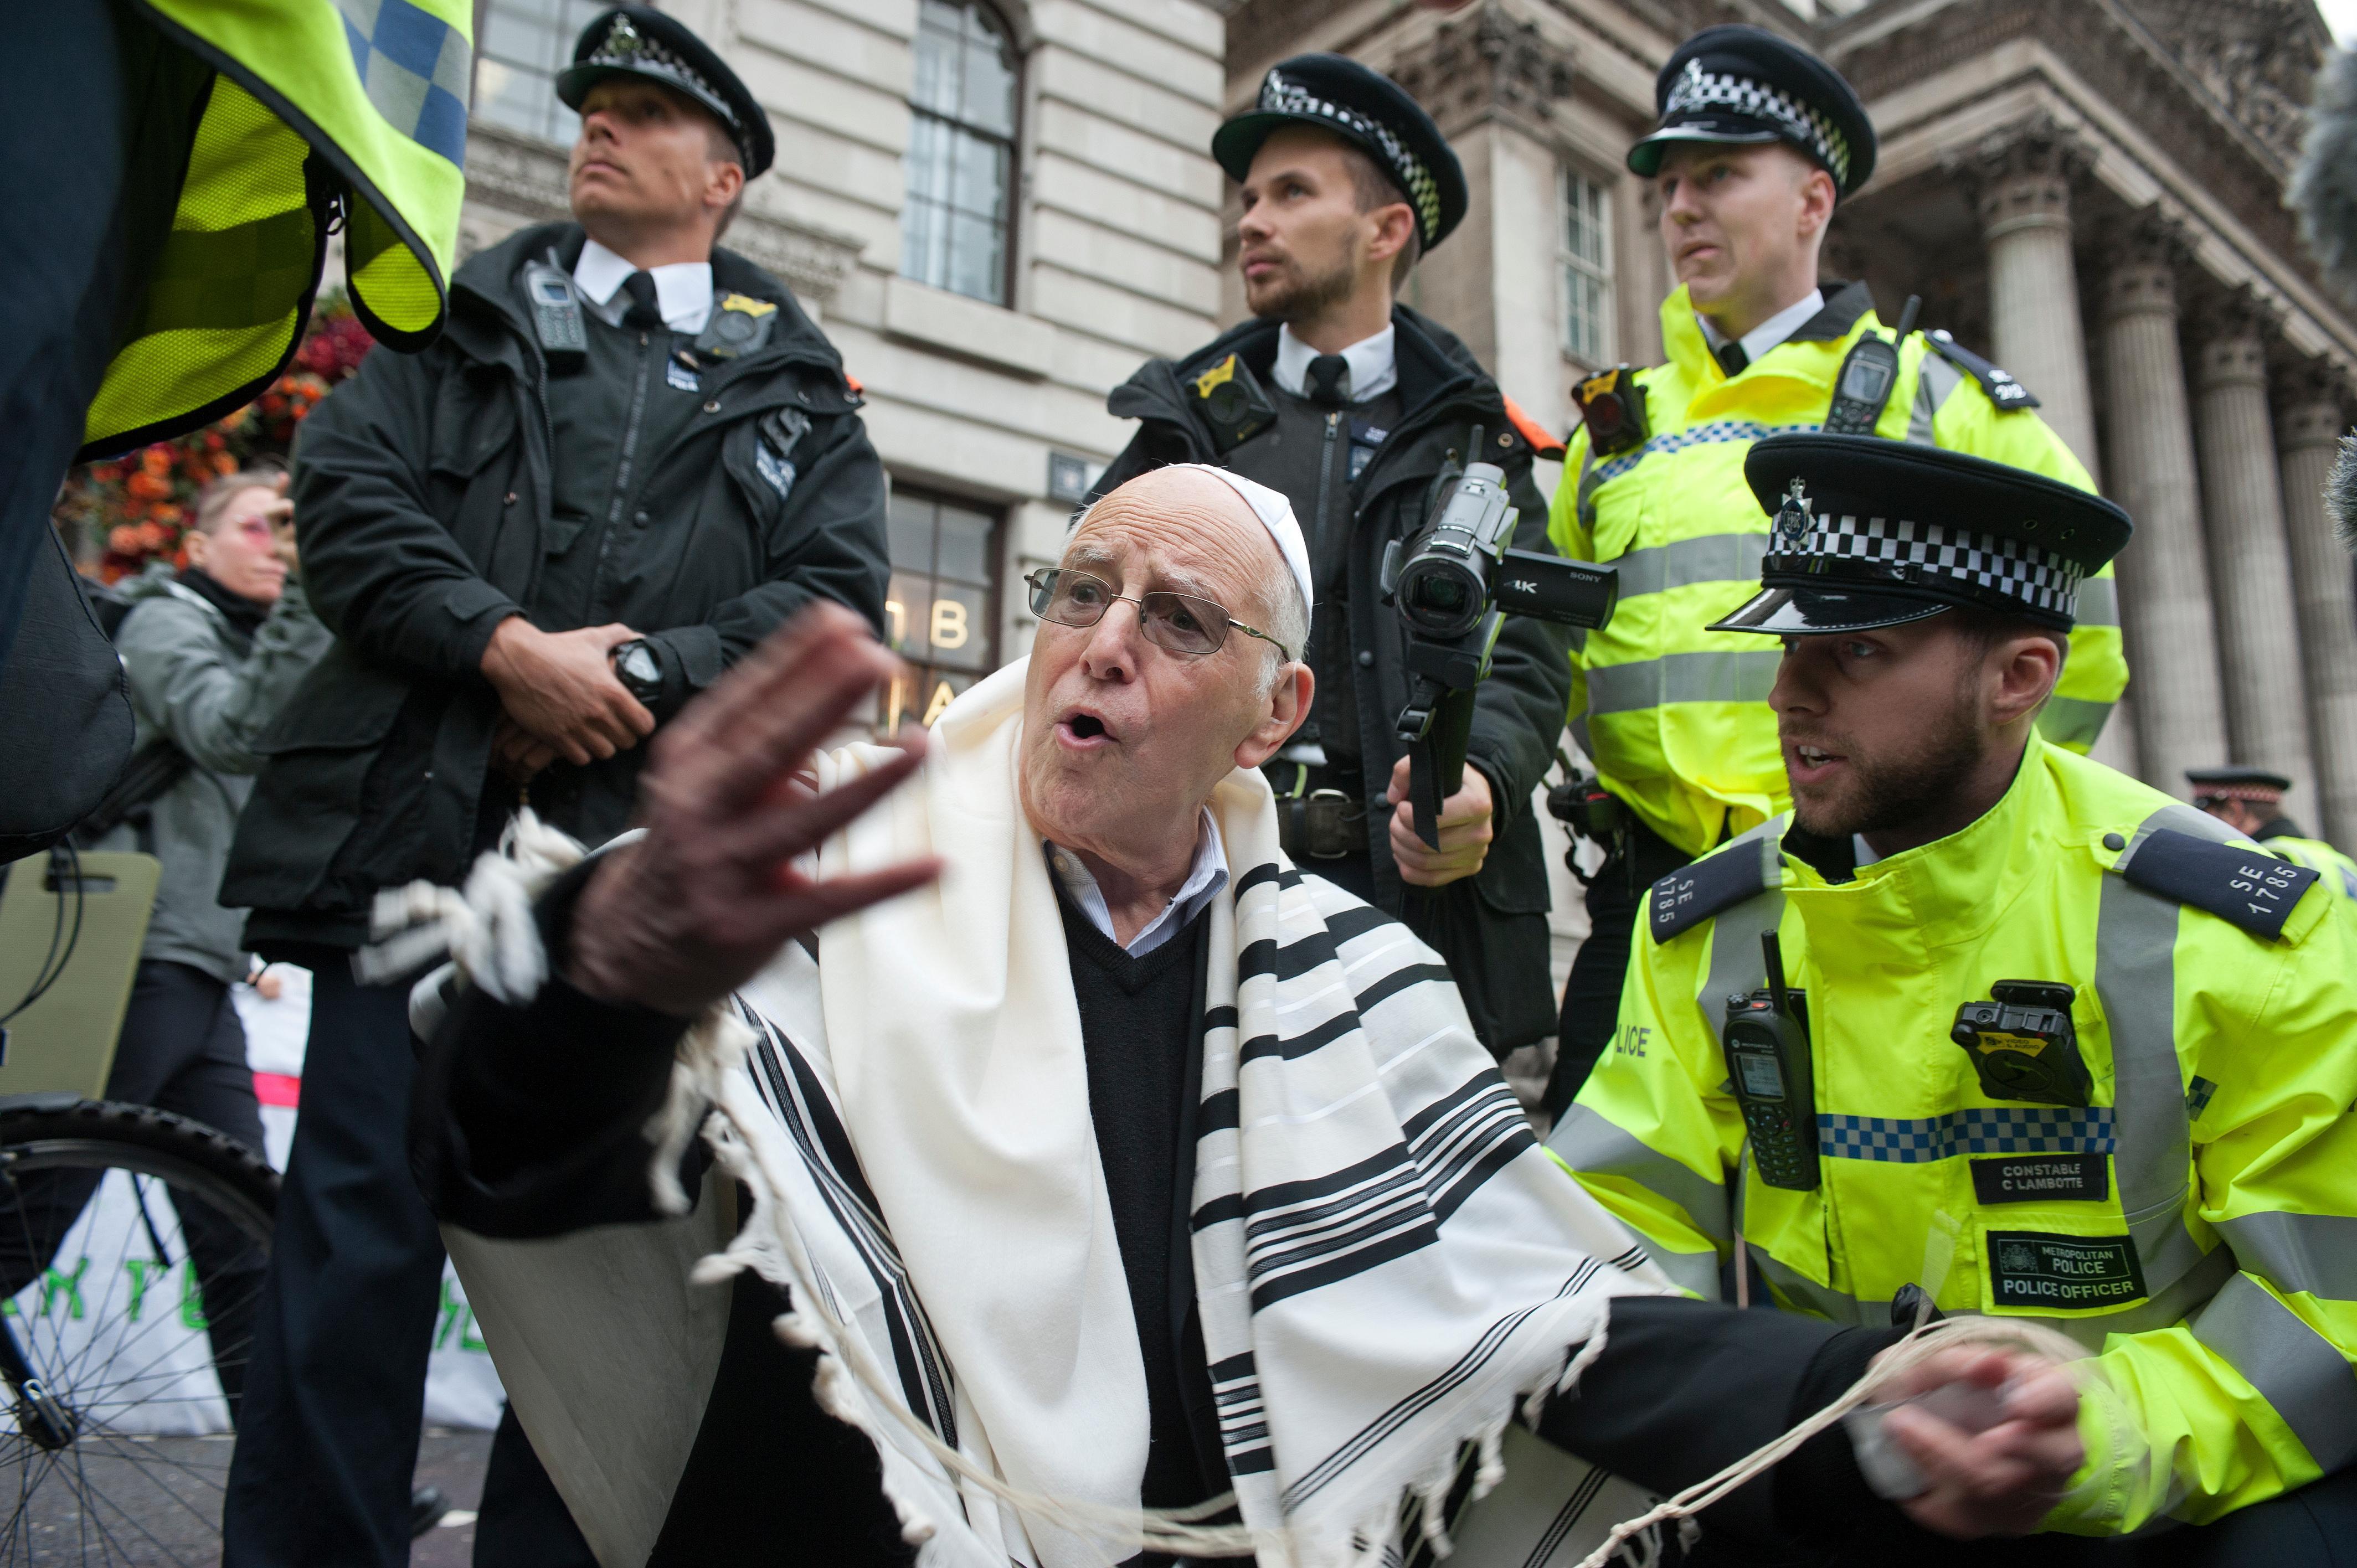 Extinction Rebellion activists arrested at Bank of England protest